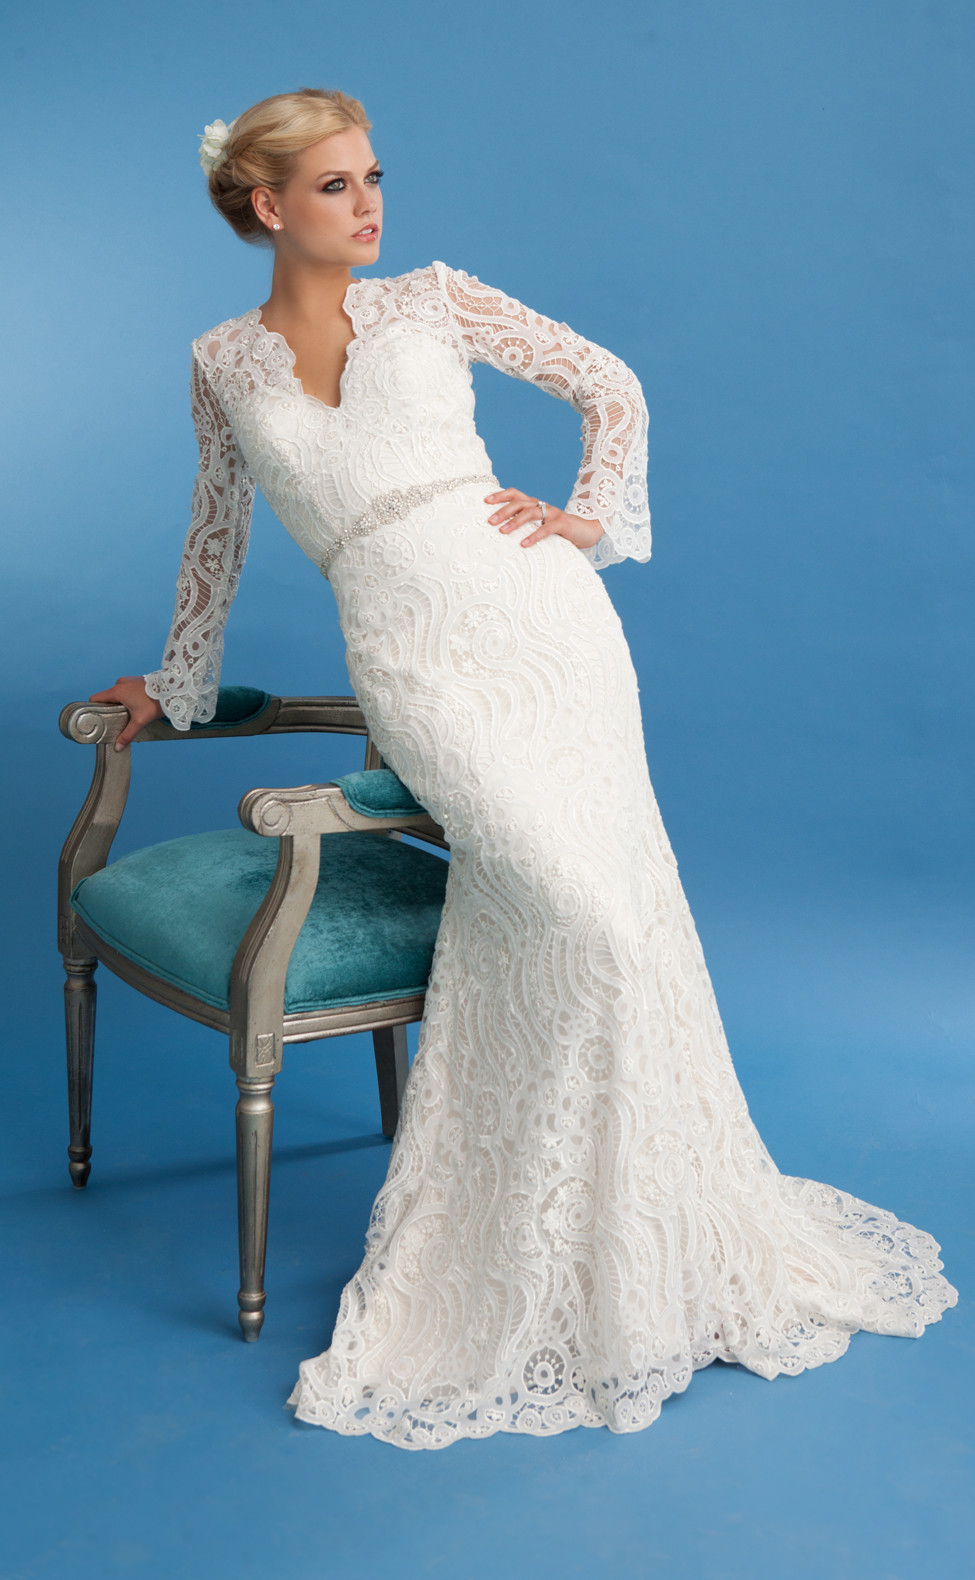 Danielle\'s Bridal - Clarksville, AR